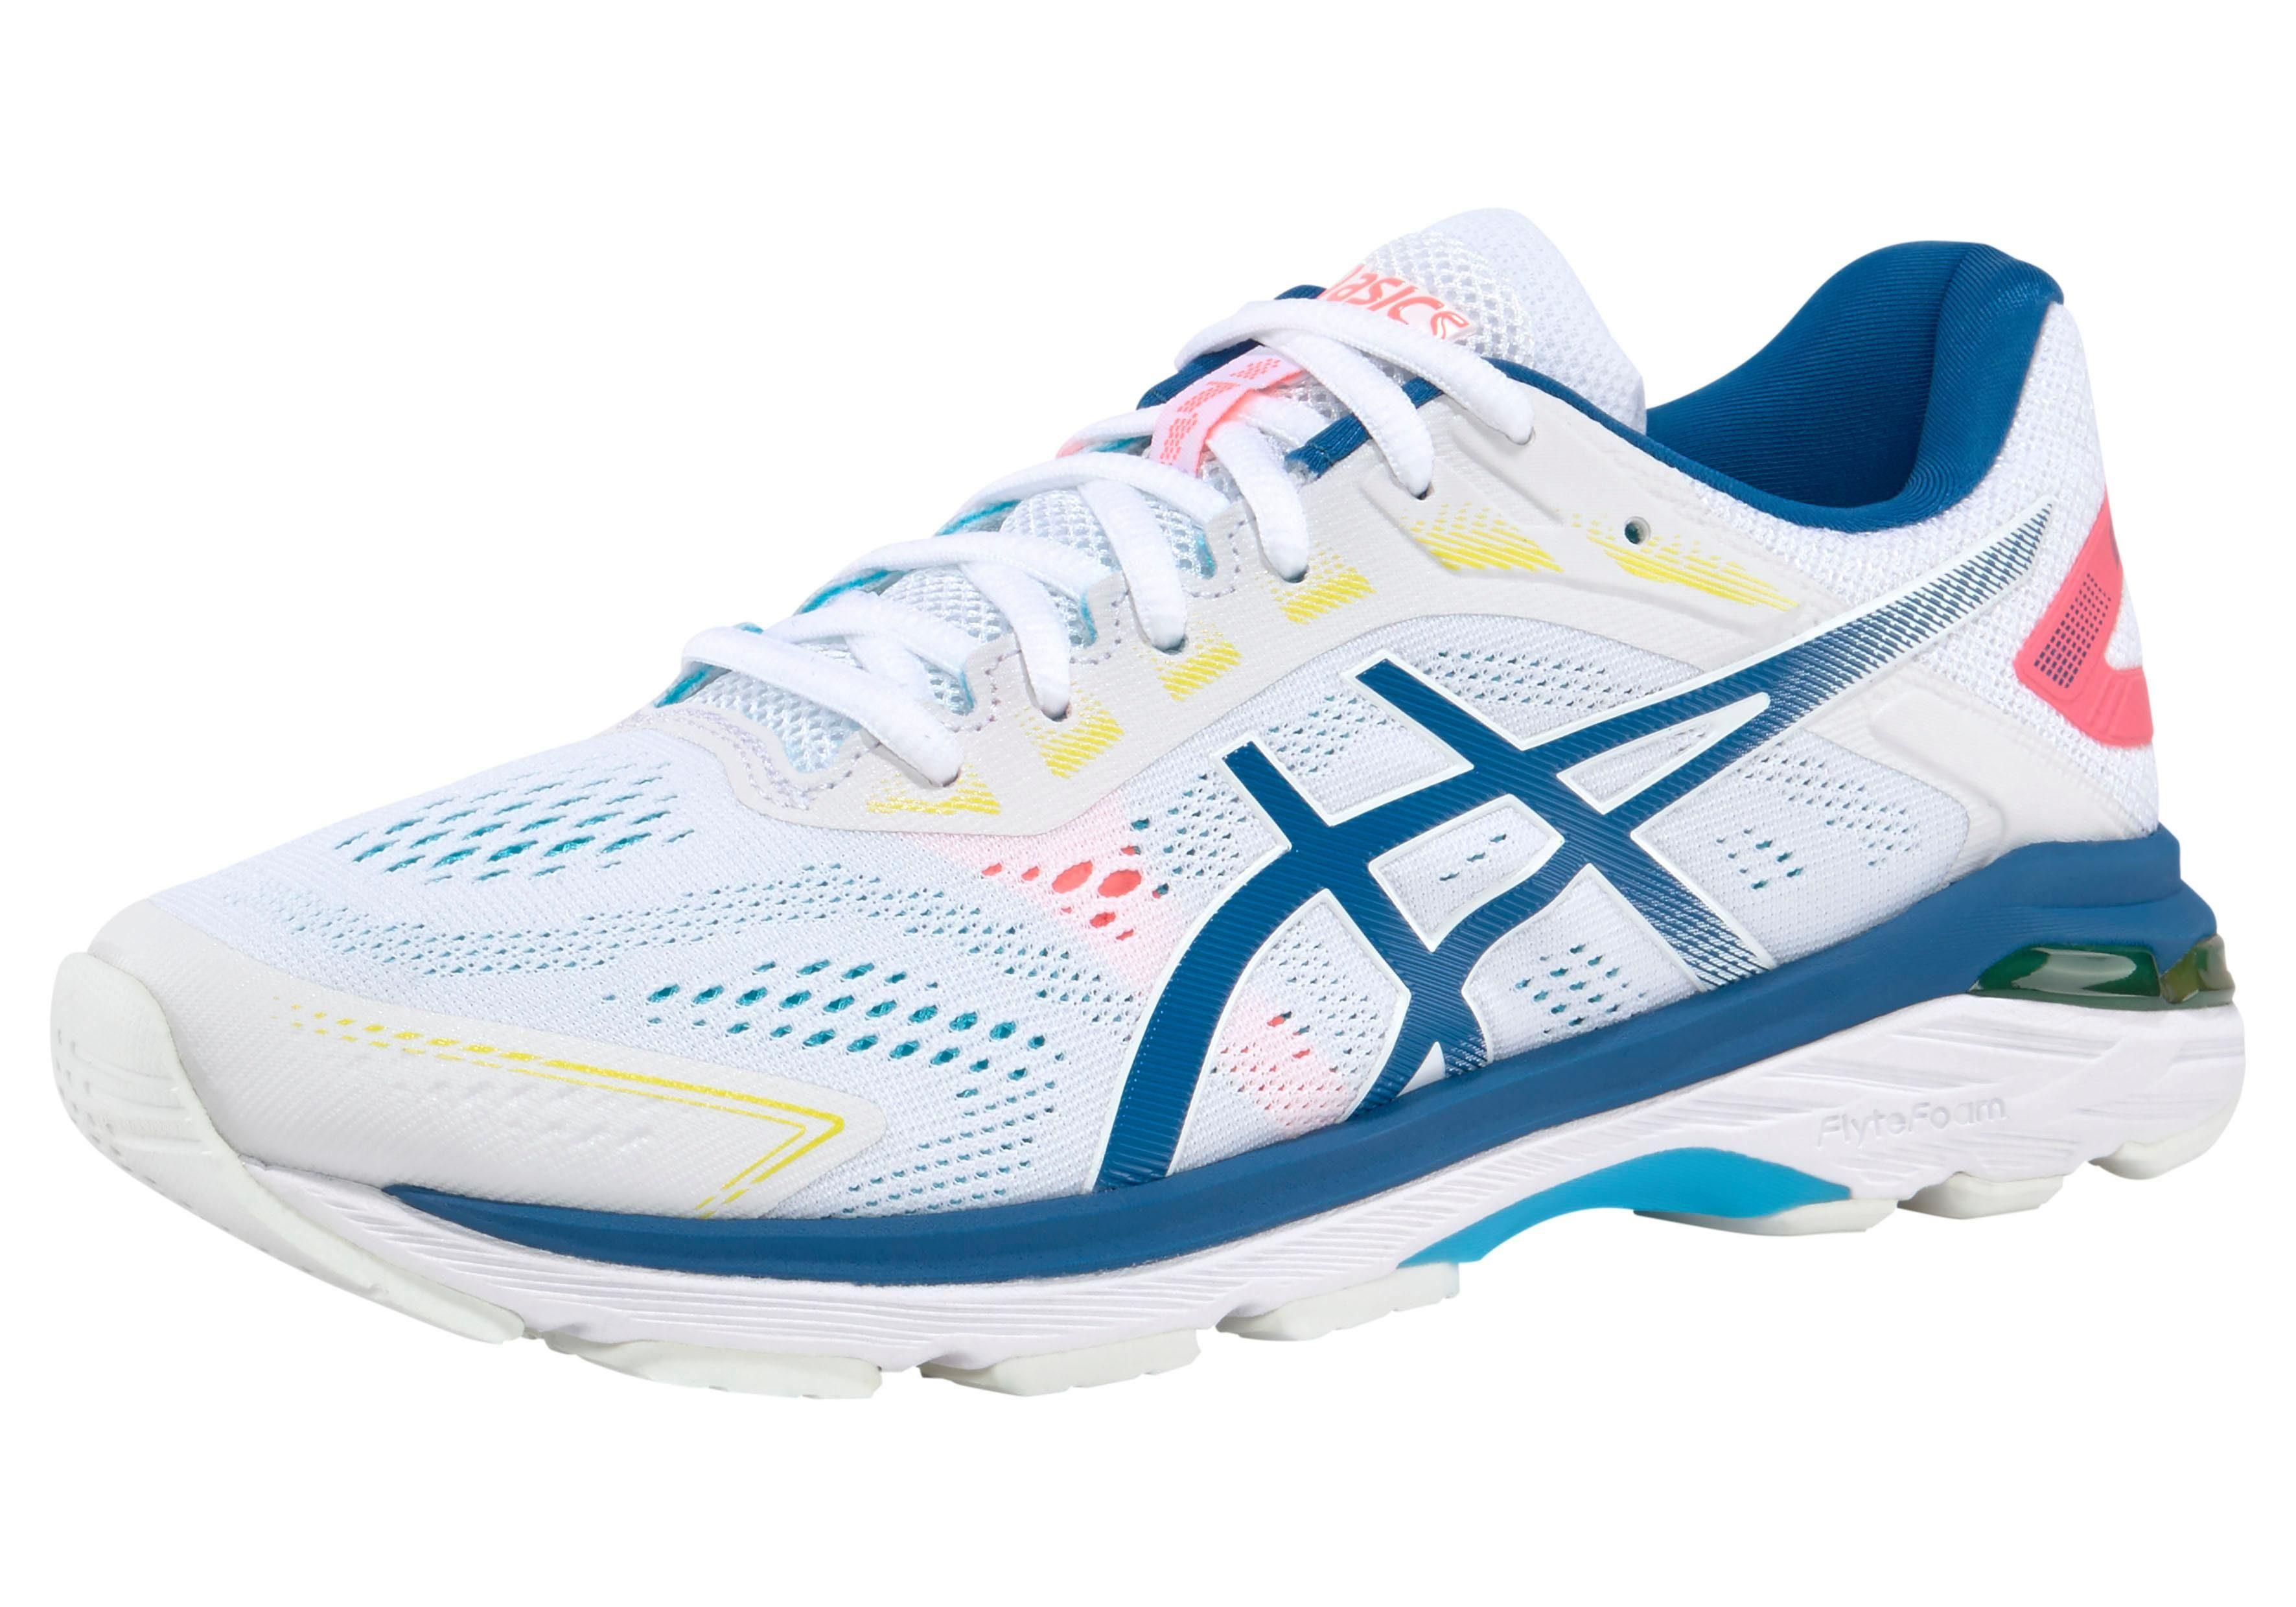 Asics »GT-2000 7« Laufschuh, Atmungsaktives Obermaterial aus Textil und  Synthetik online kaufen | OTTO